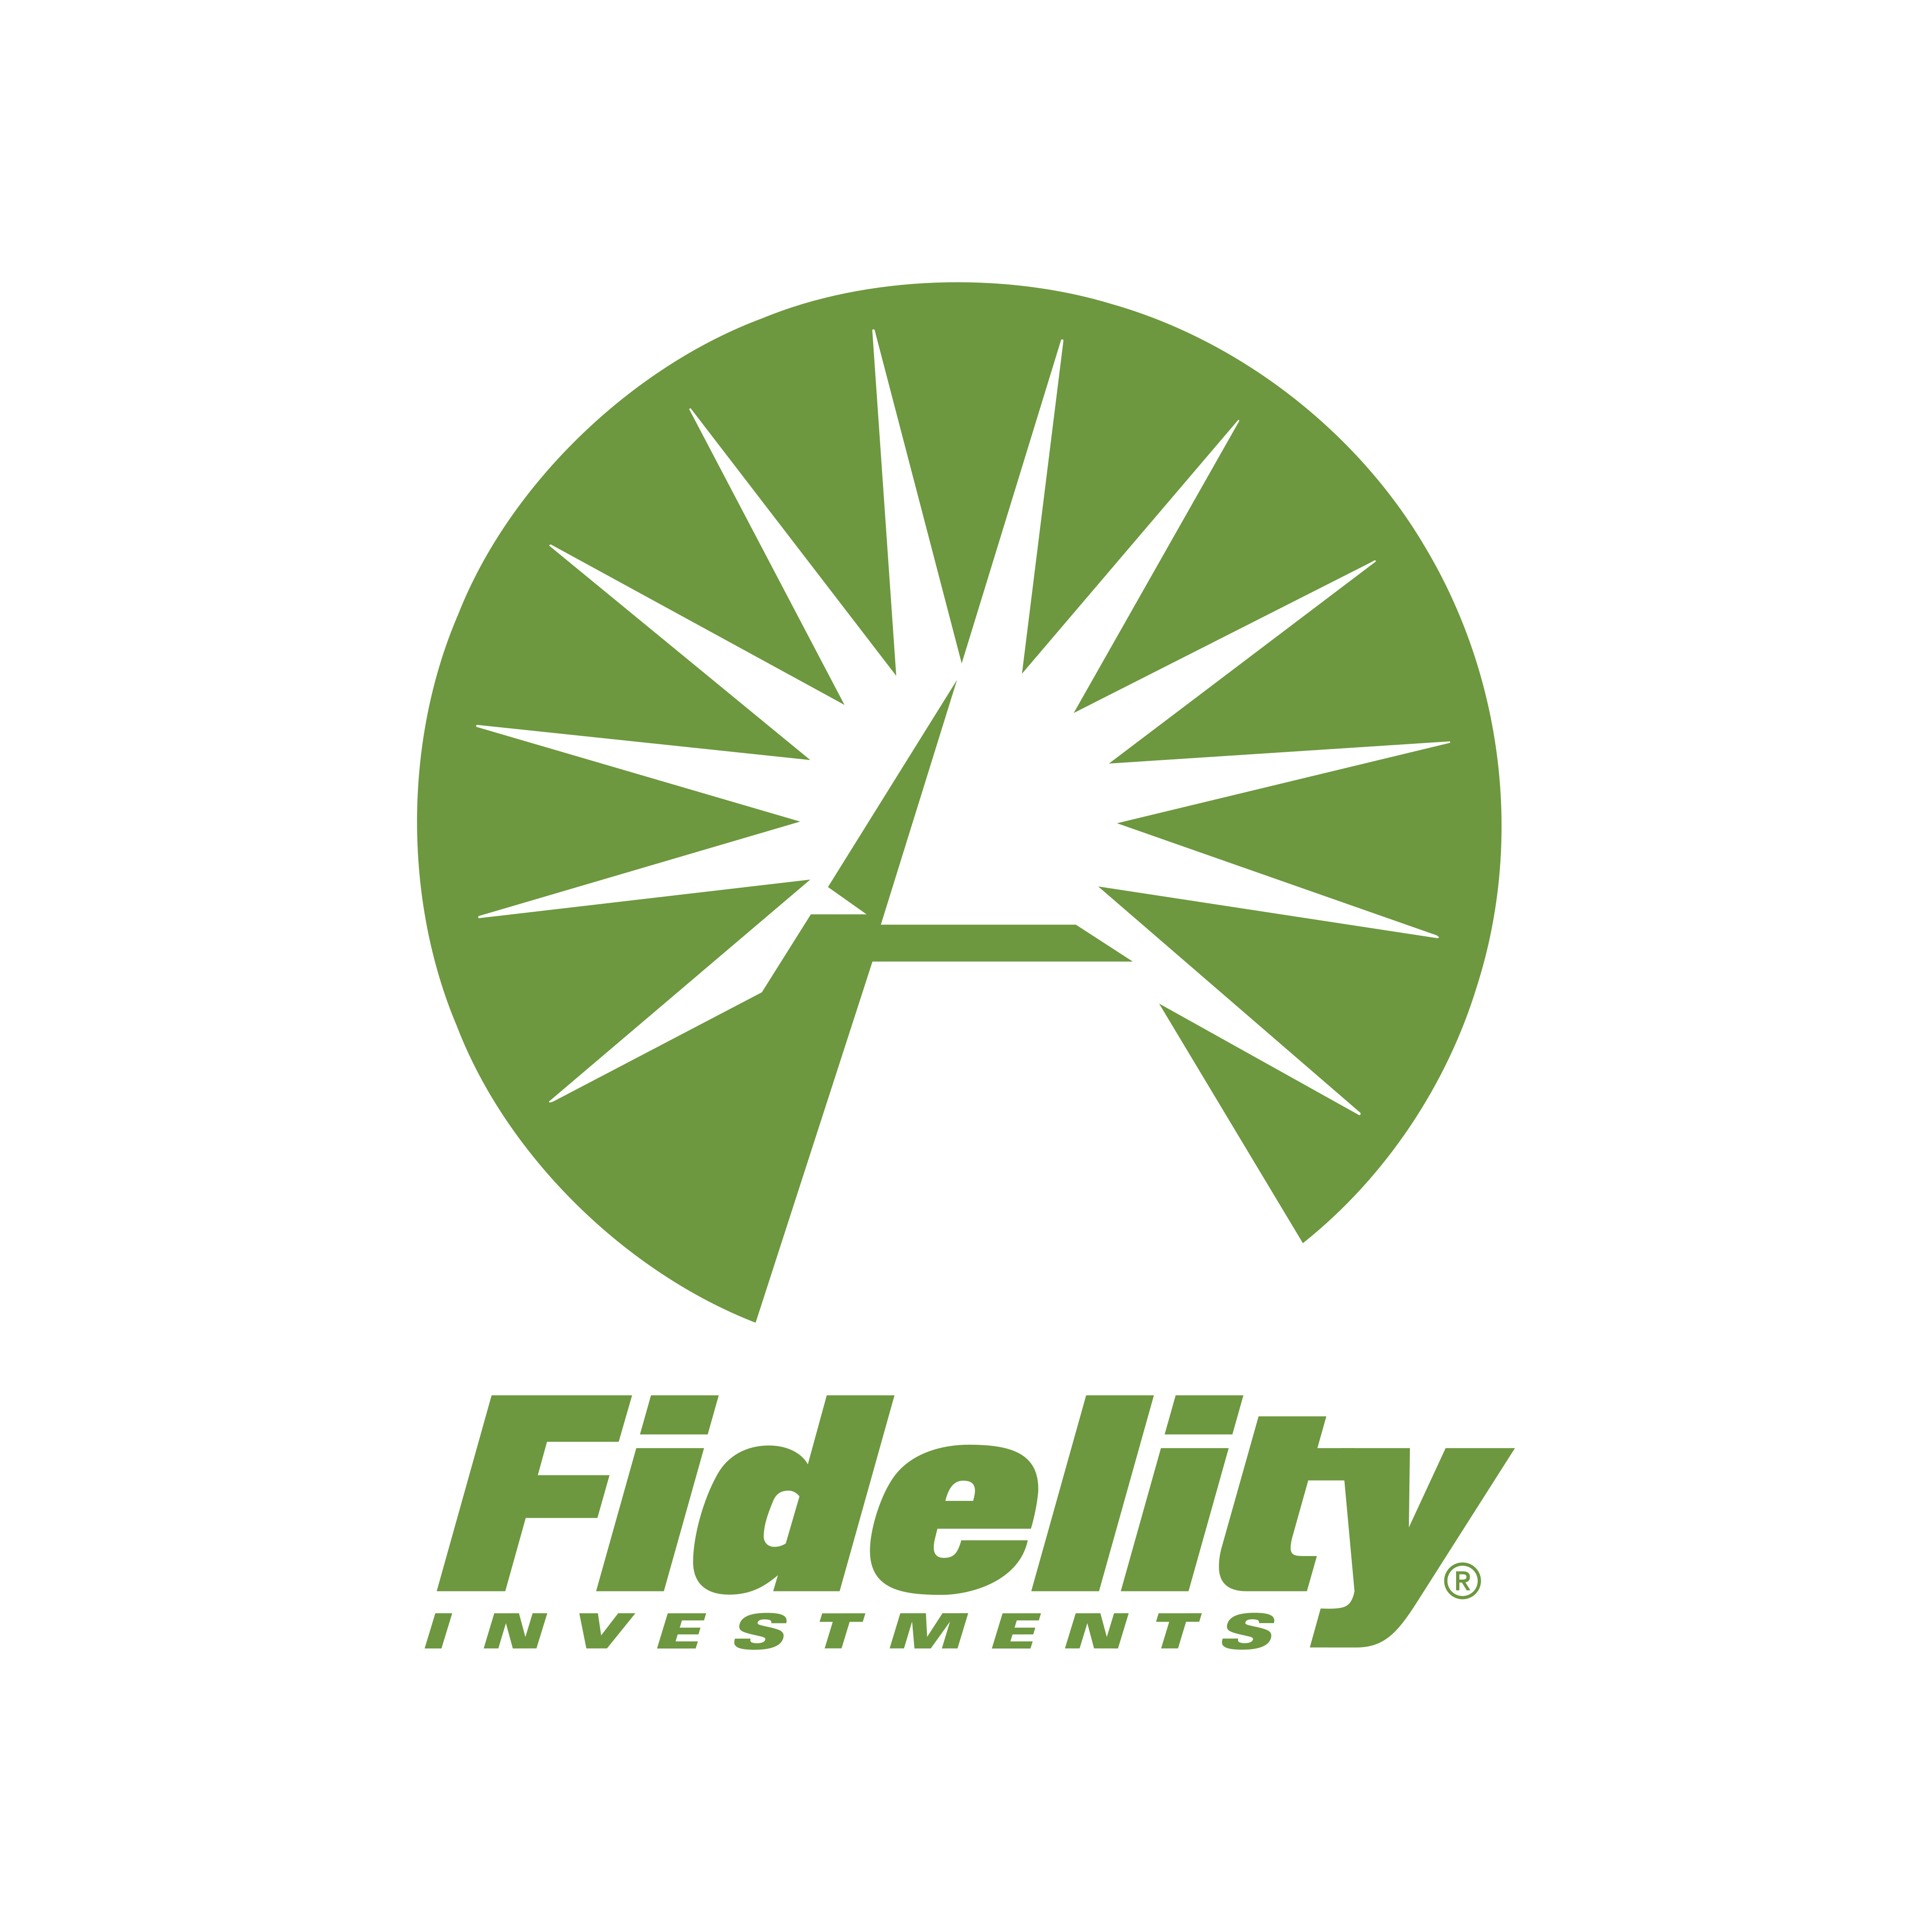 fidelity investments logo 0 - Fidelity Investments Logo